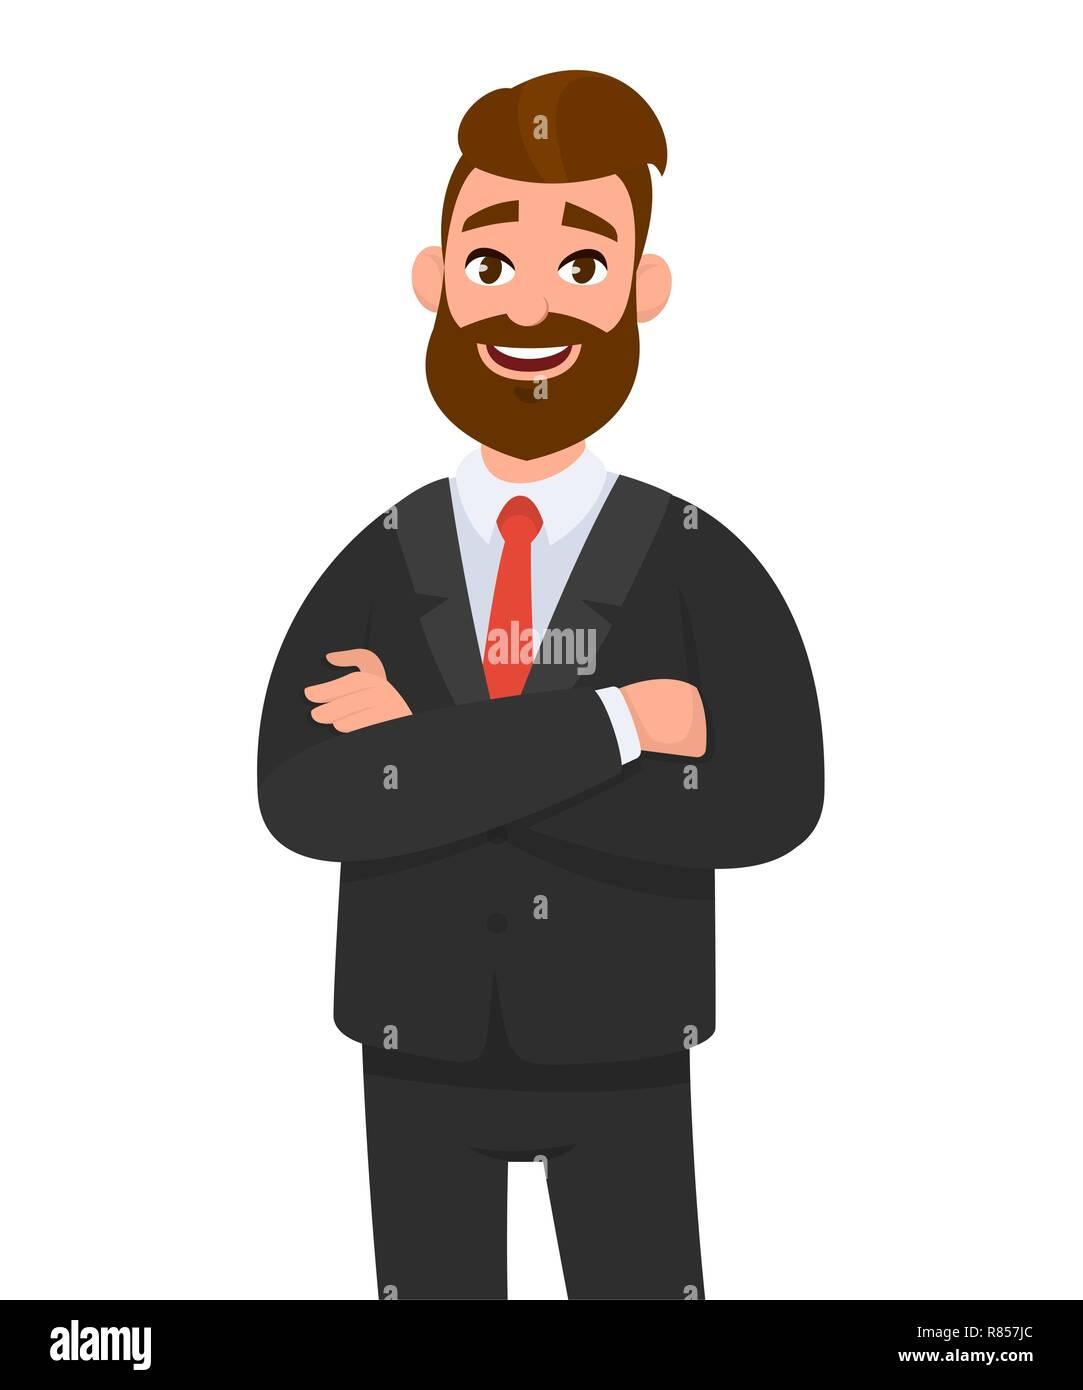 d2fd11603 Man Formal Suit Background Vector Imágenes De Stock & Man Formal ...